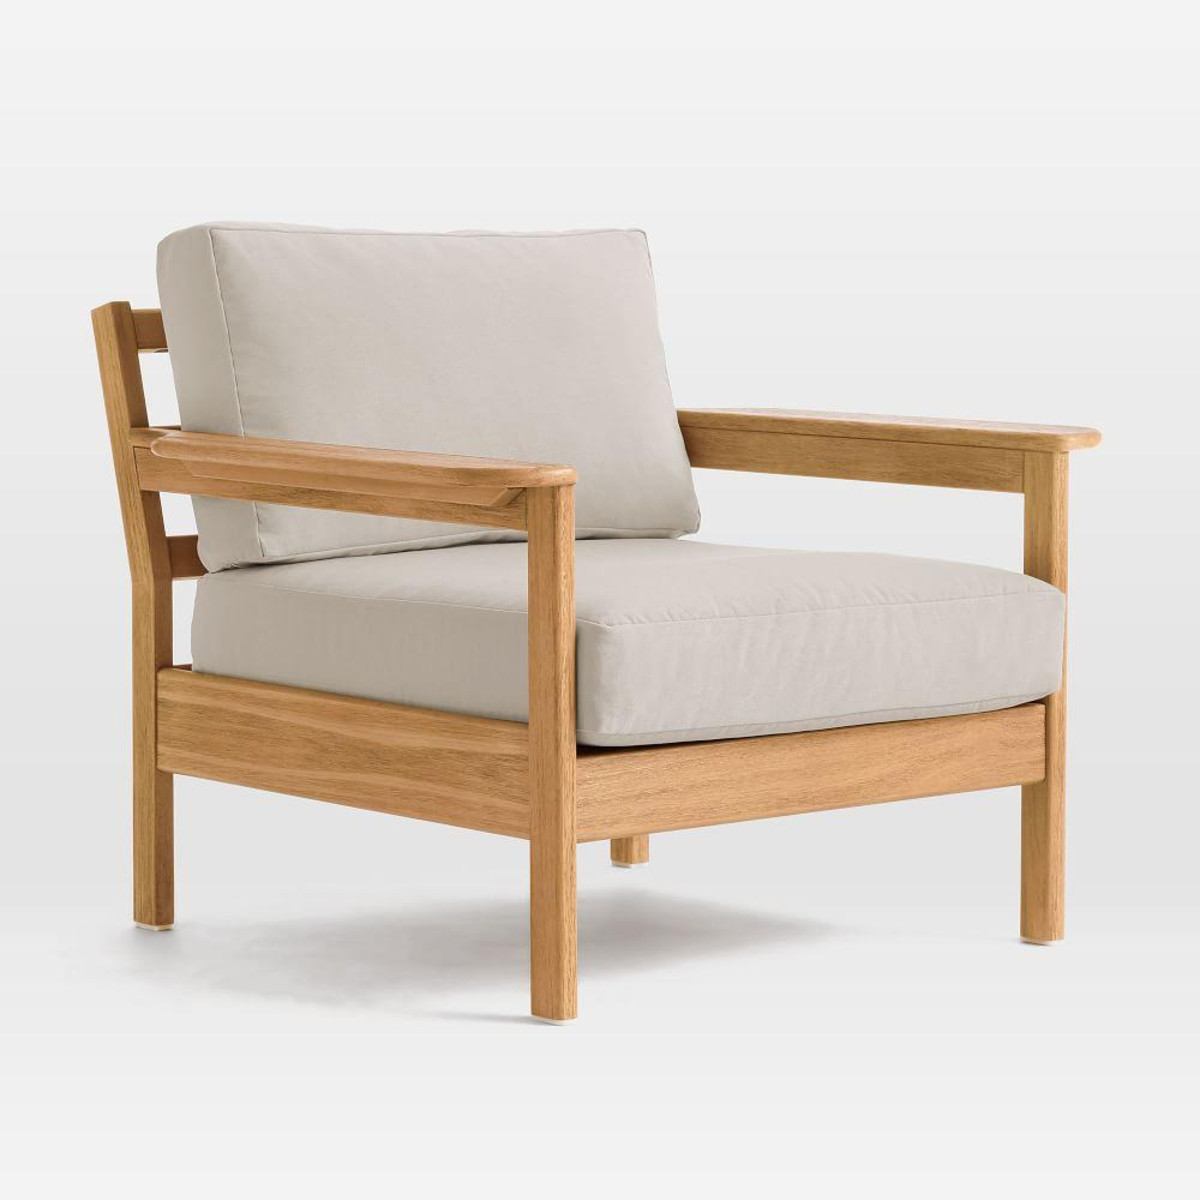 playa-outdoor-lounge-chair-h4127-alt1_imgz-2